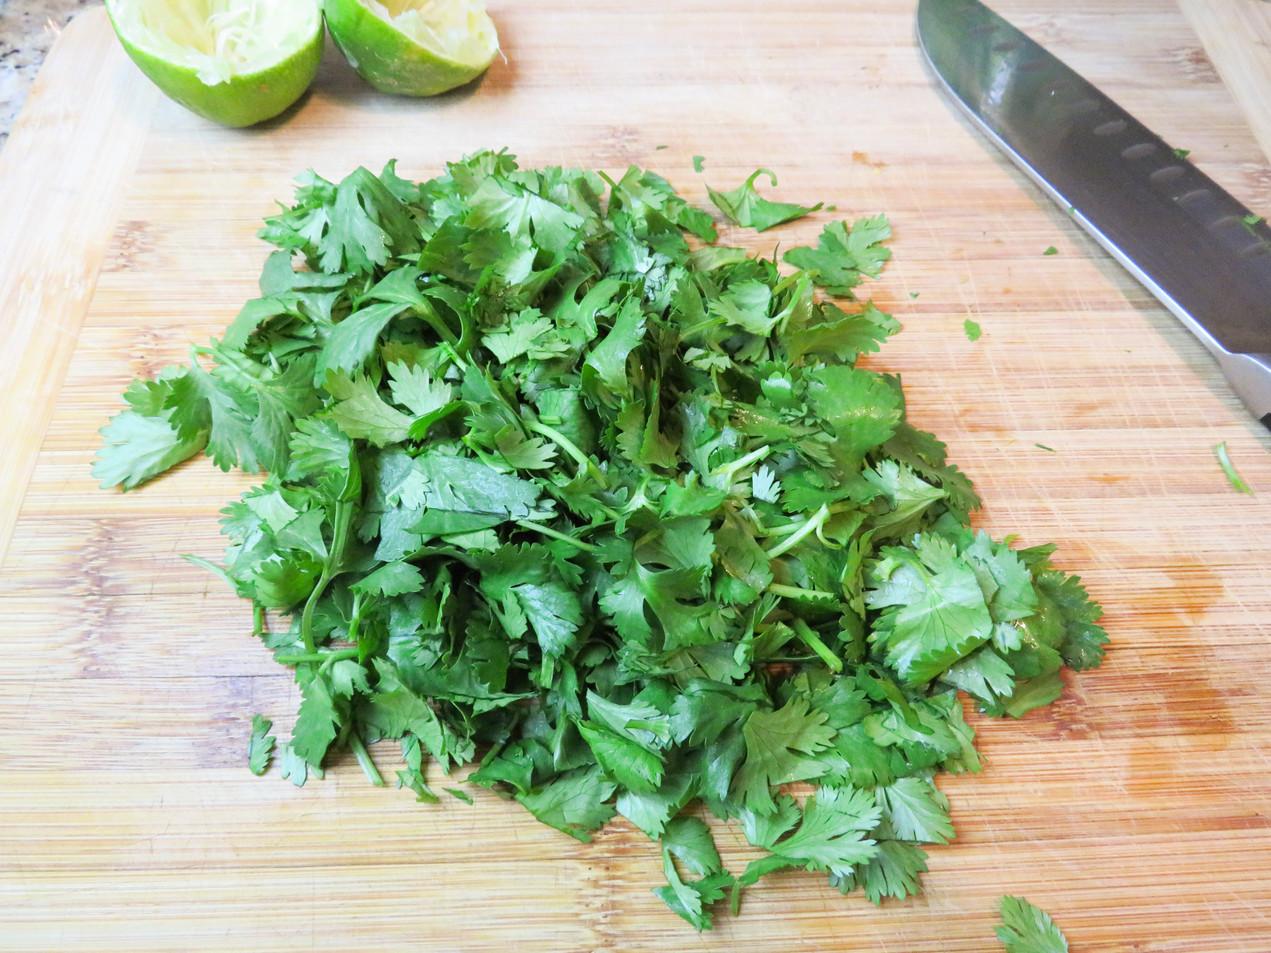 Chopped cilantro.